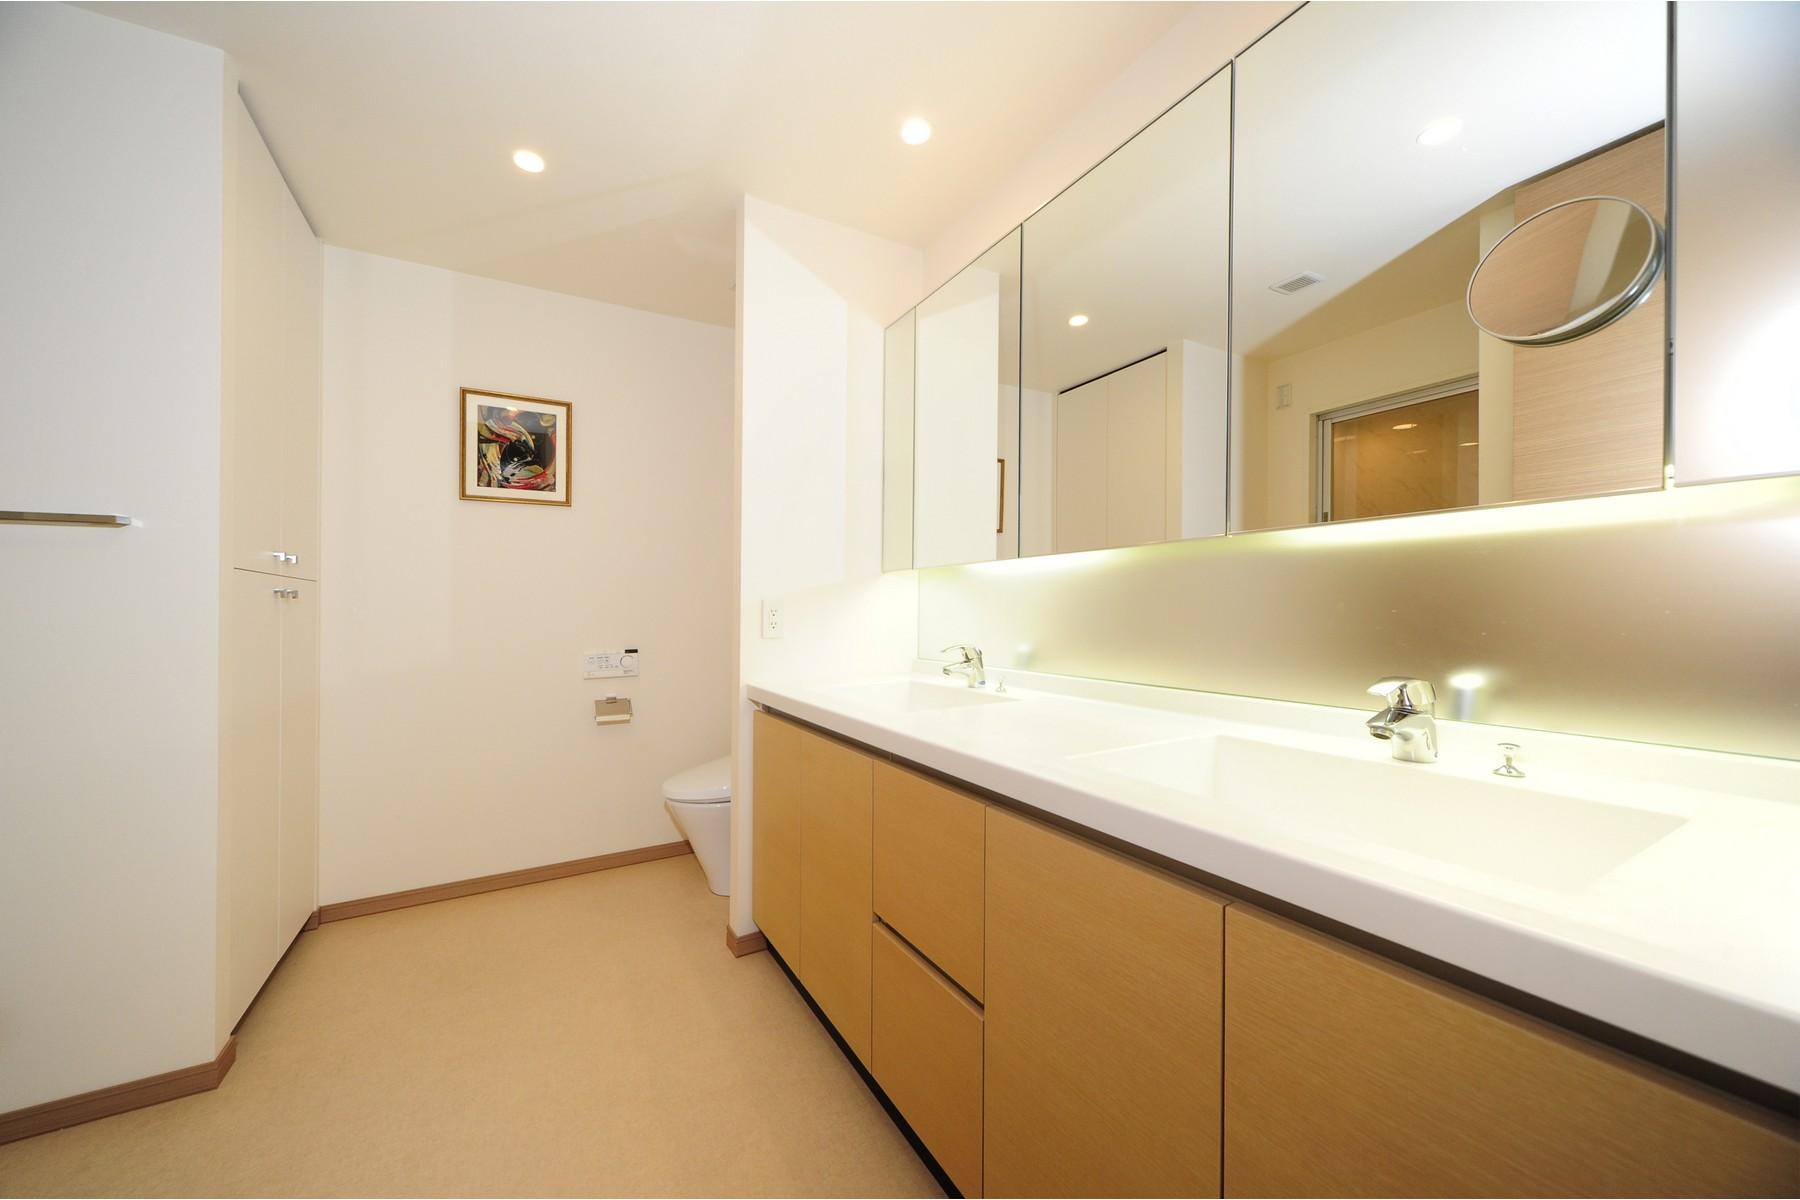 Additional photo for property listing at Saion Sakurazaka Minato-Ku, Tokyo Japonya